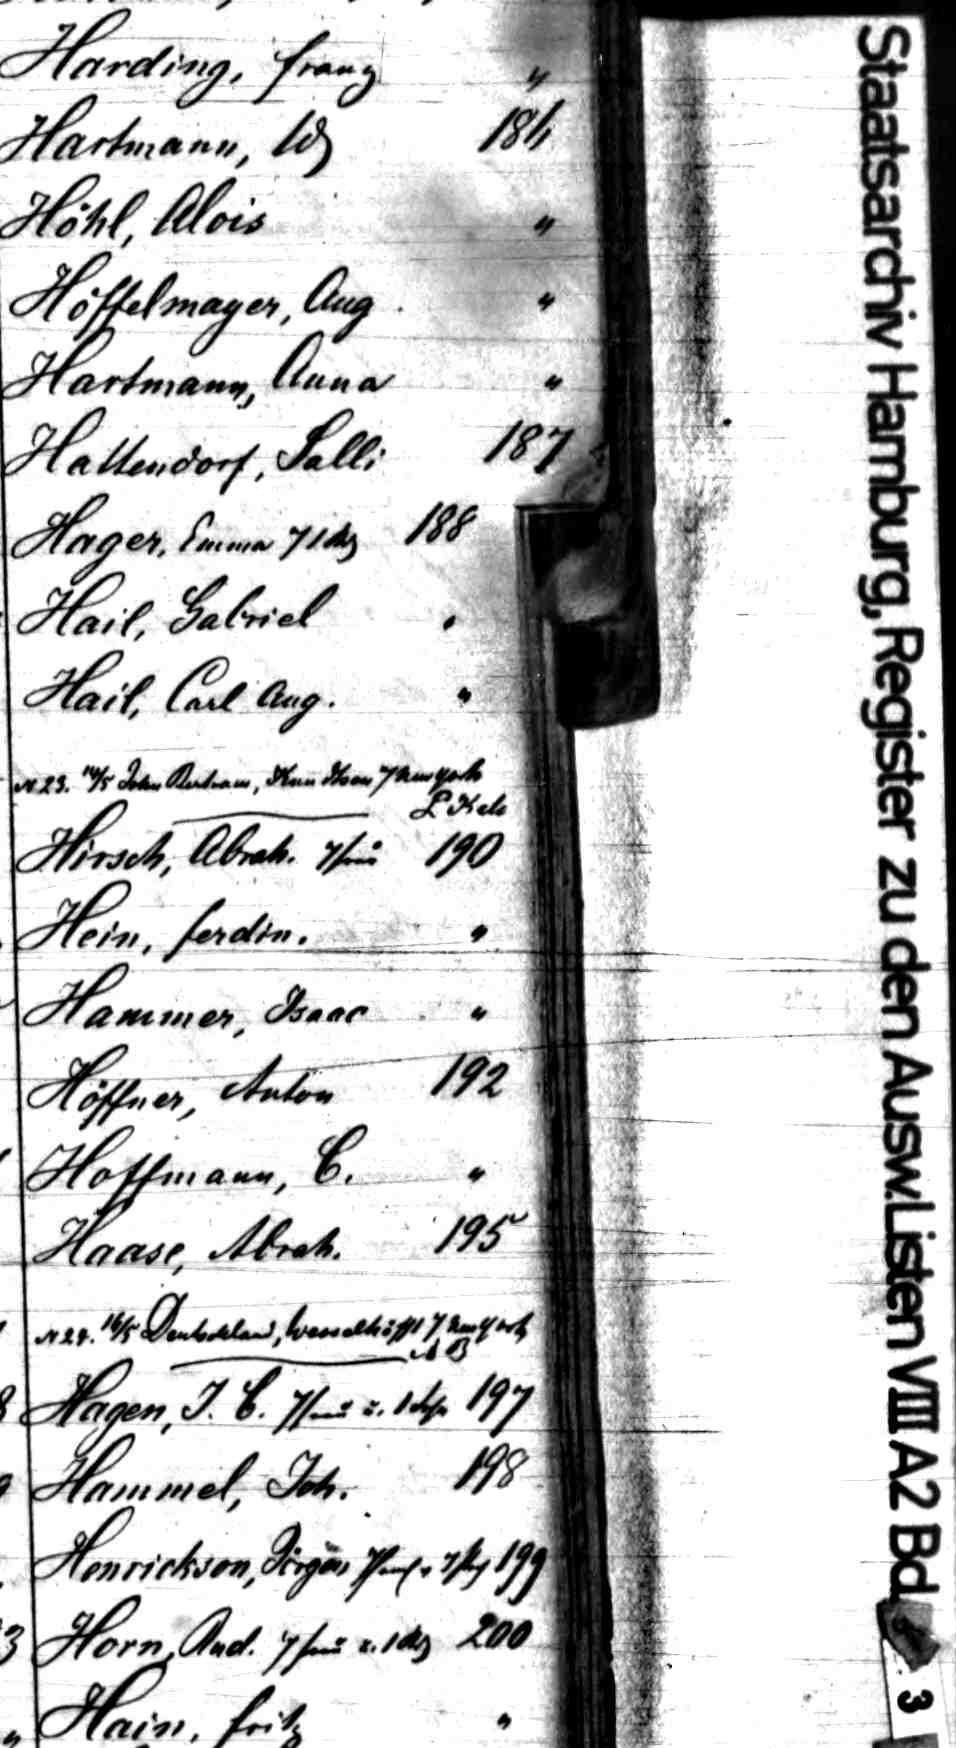 1860 Hamburg Direct Index Passenger List 16 May